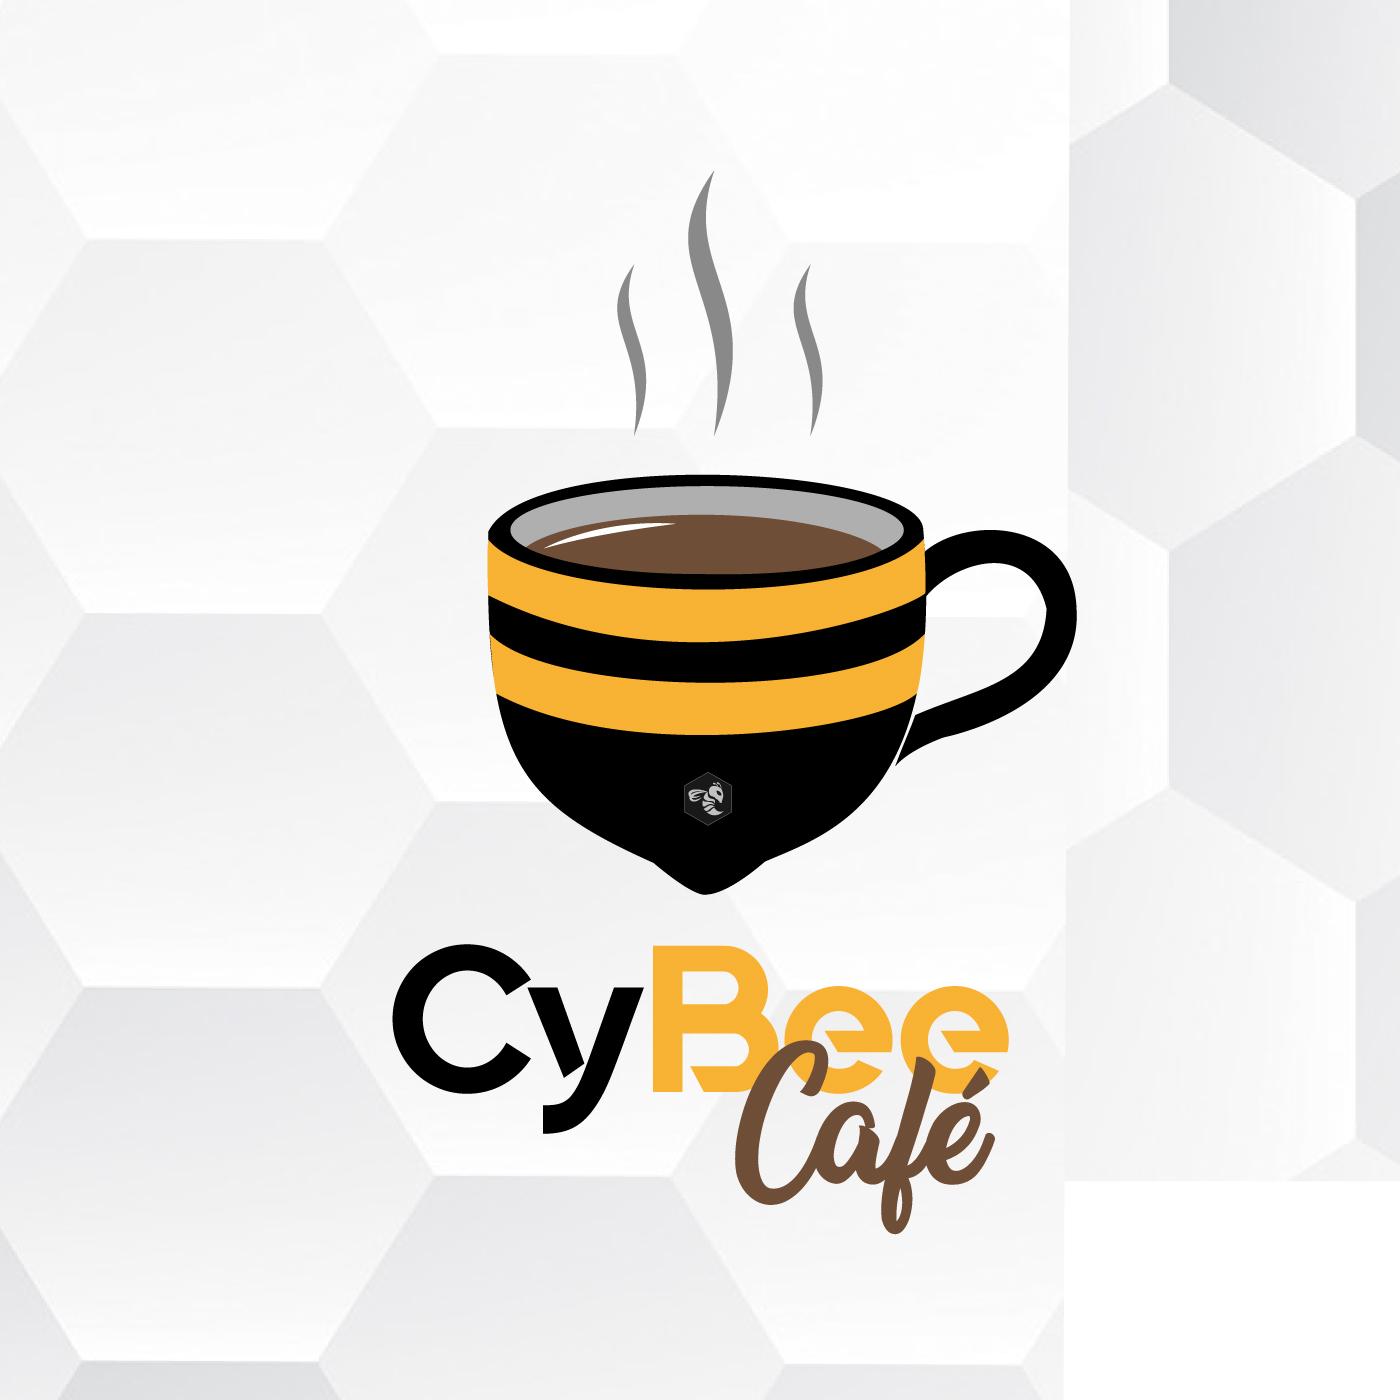 Cybee Café